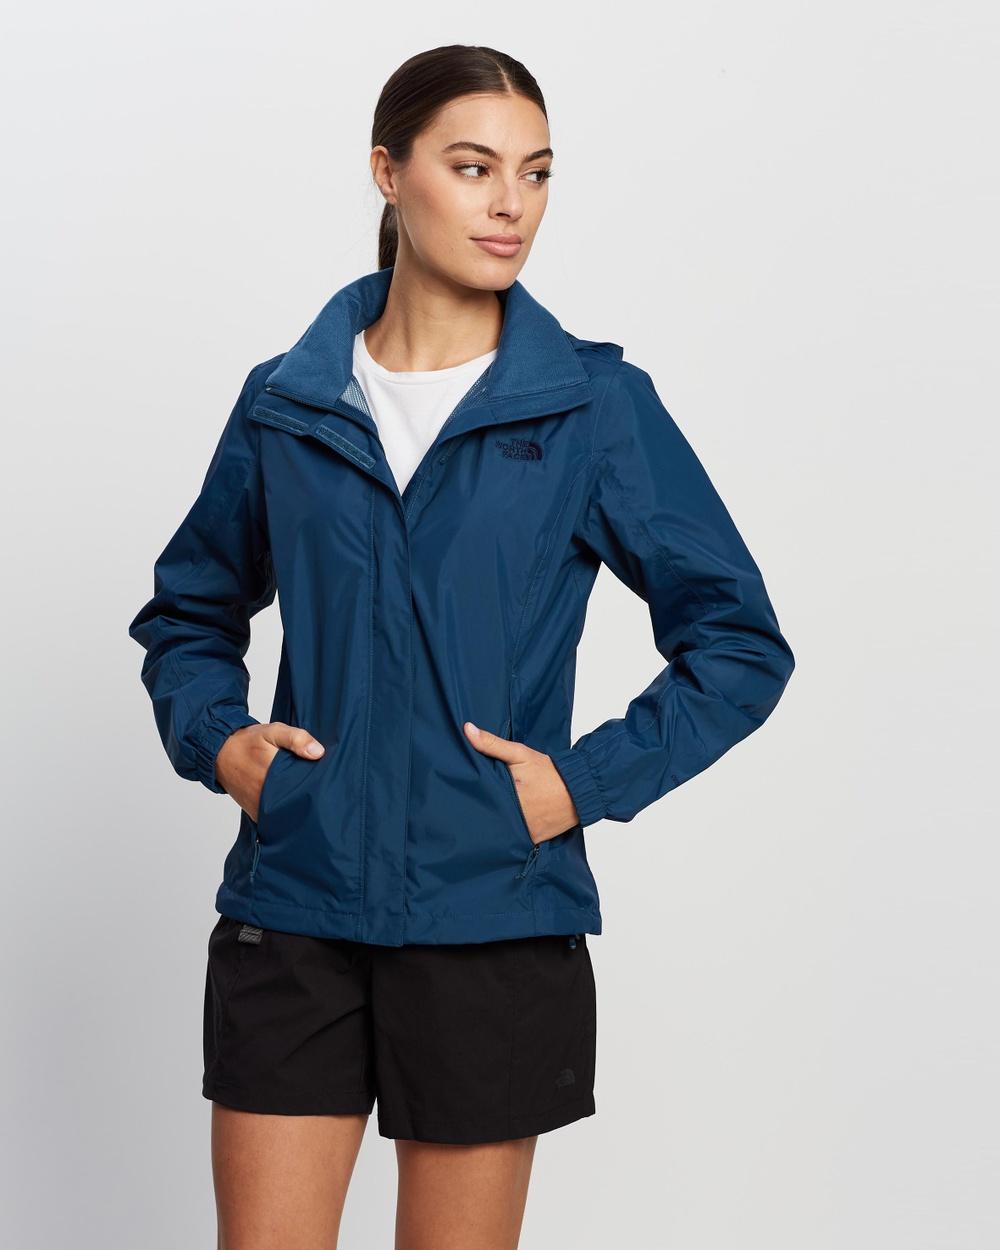 The North Face Resolve 2 Jacket Coats & Jackets Monterey Blue